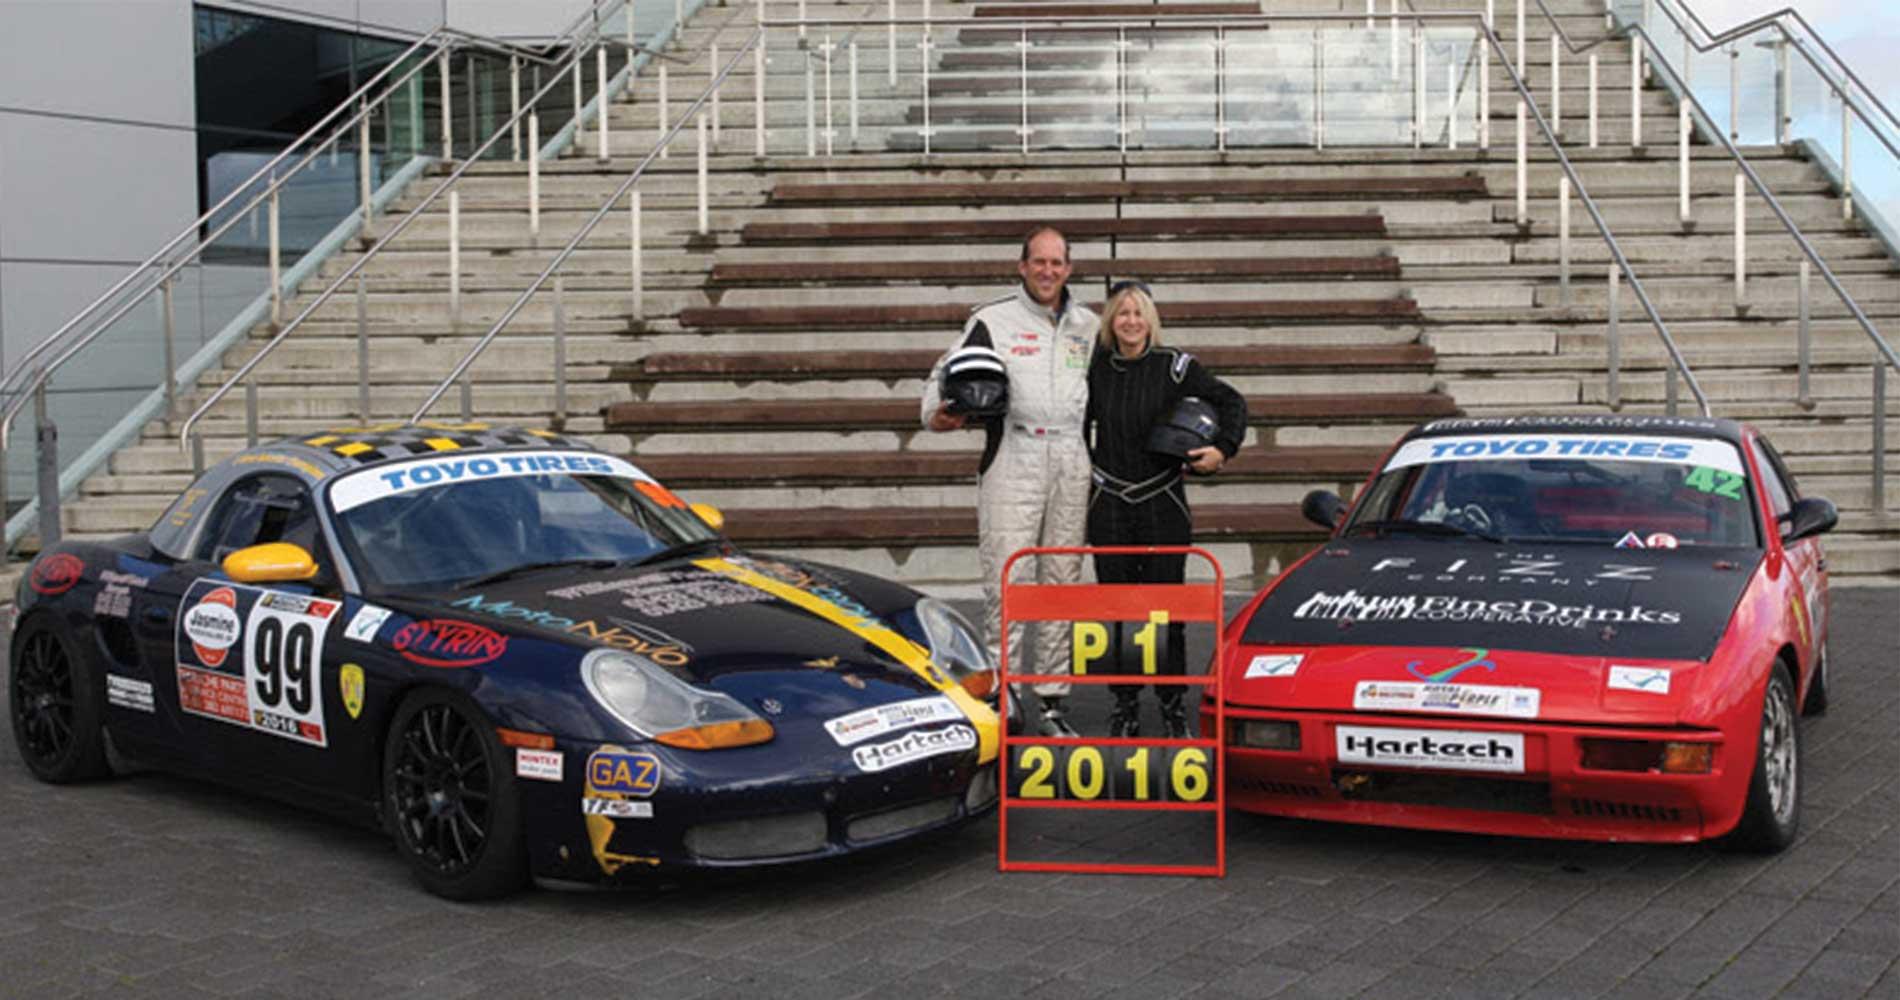 toyo-brscc-porsche-championship-race-report-motorsportdays-track-days-5